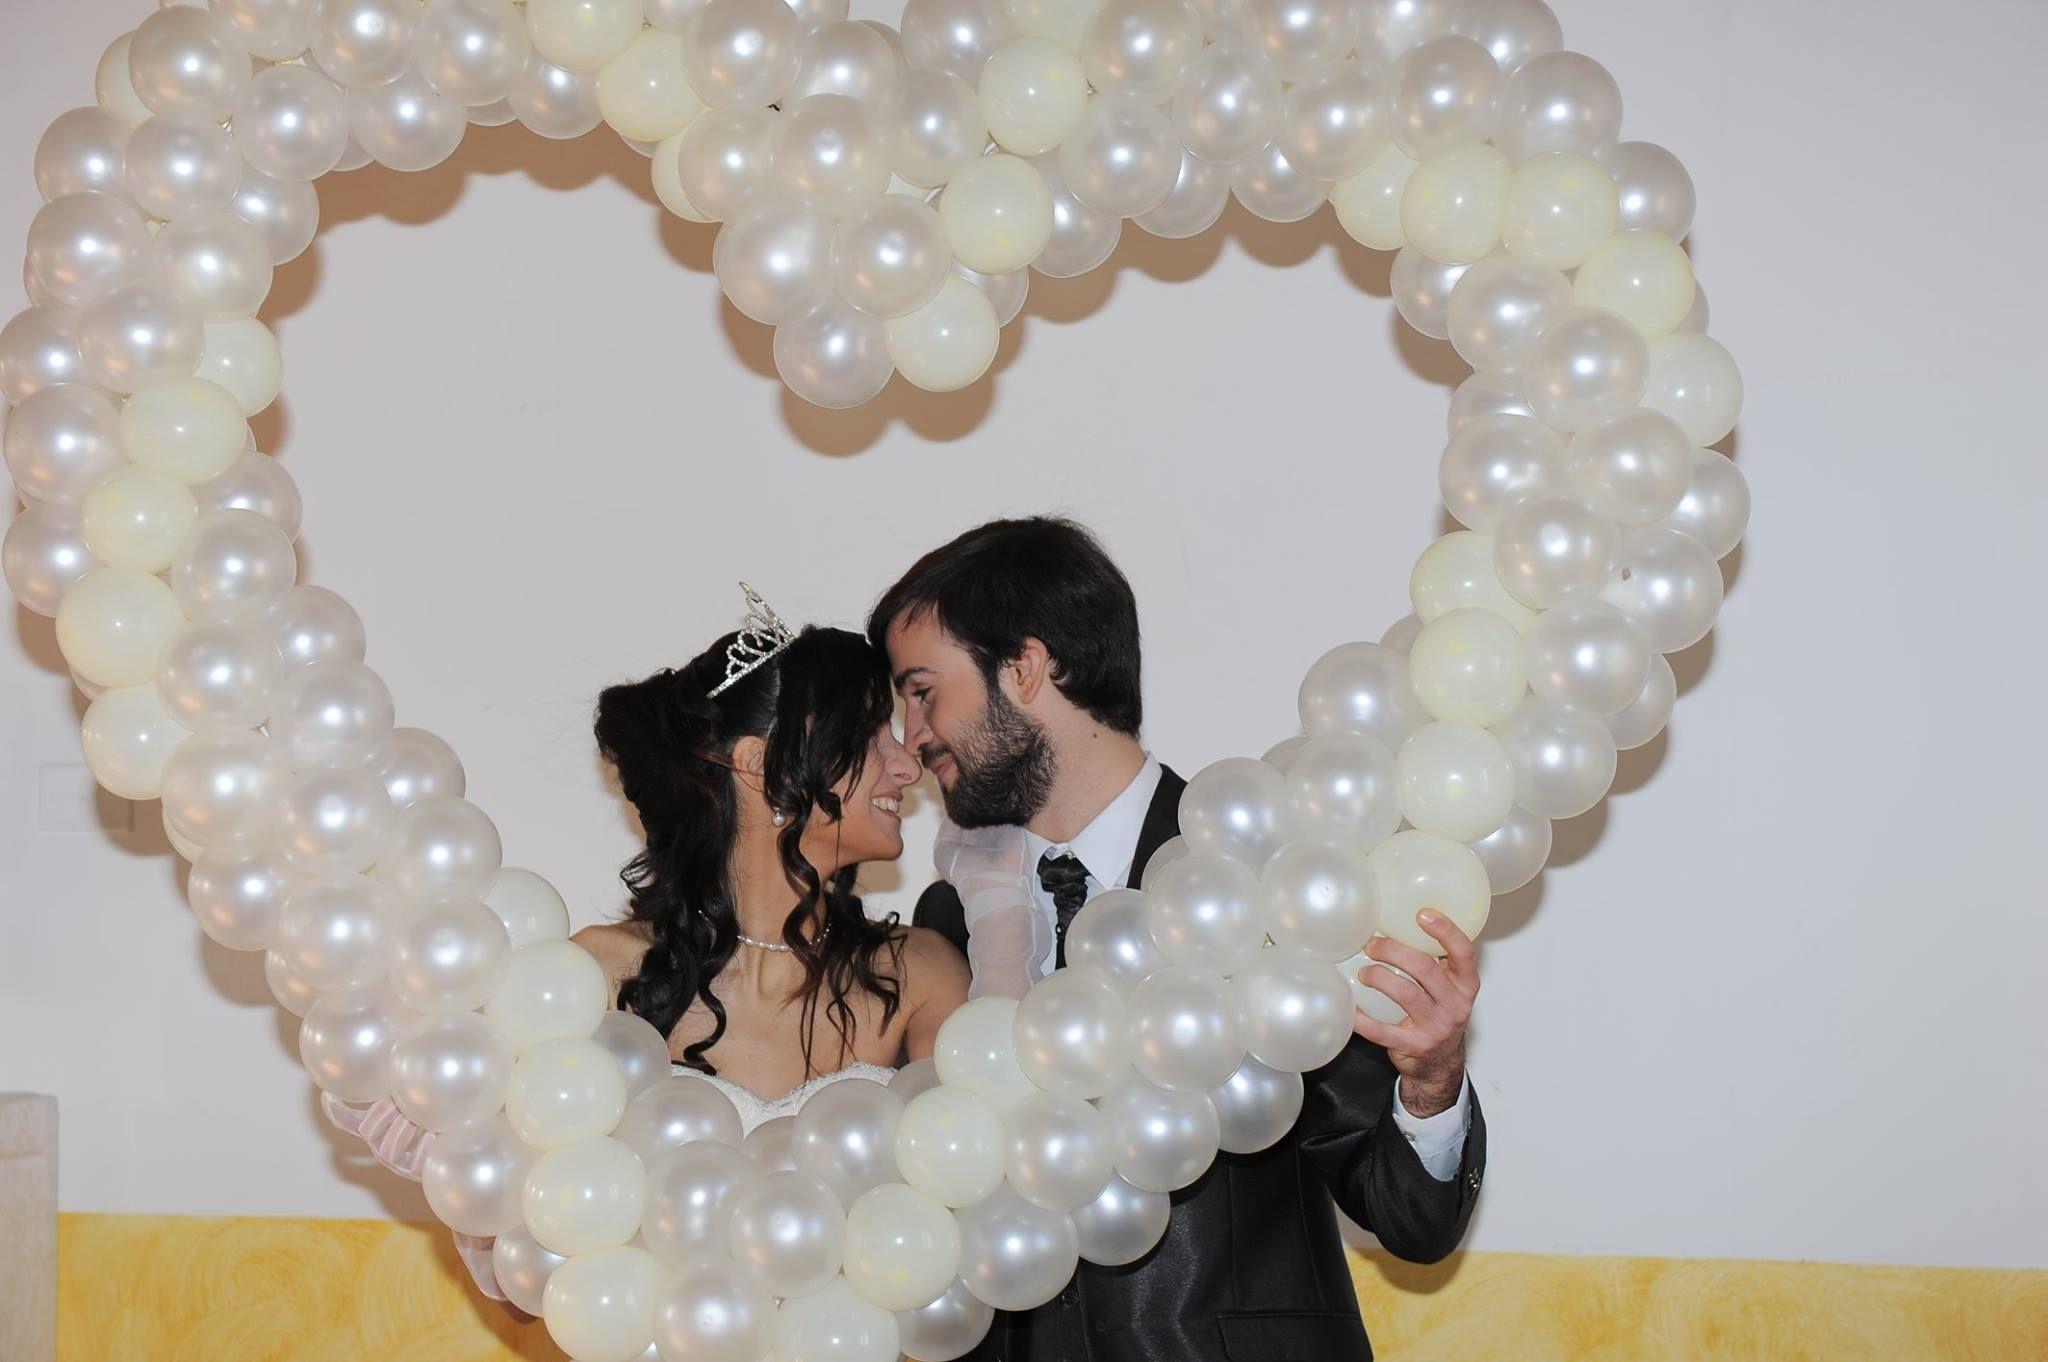 Matrimonio Palloncini Matrimonio Palloncini Ad Elio